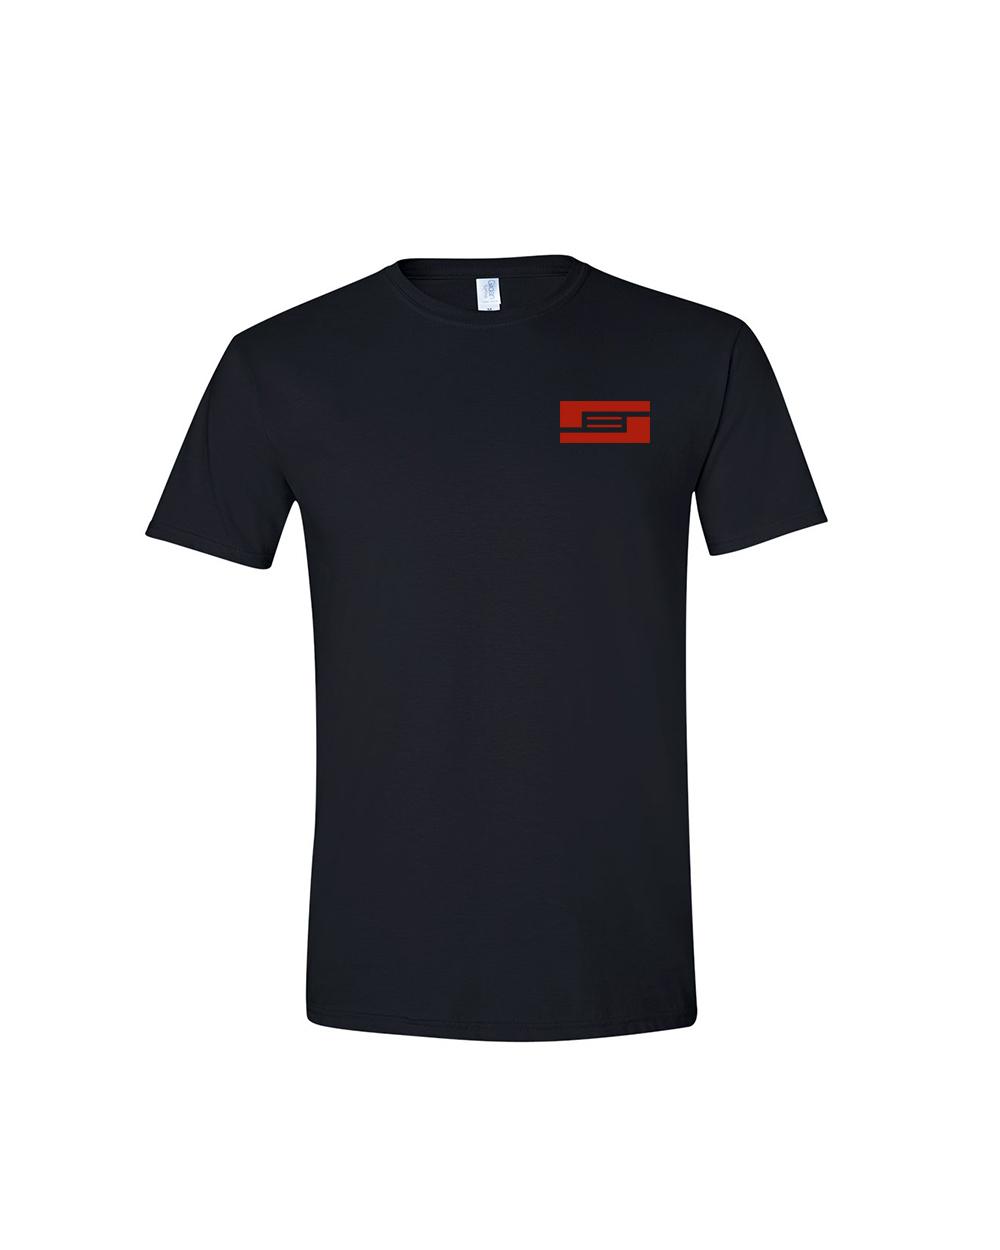 BYRD Pocket Logo Black Shirt